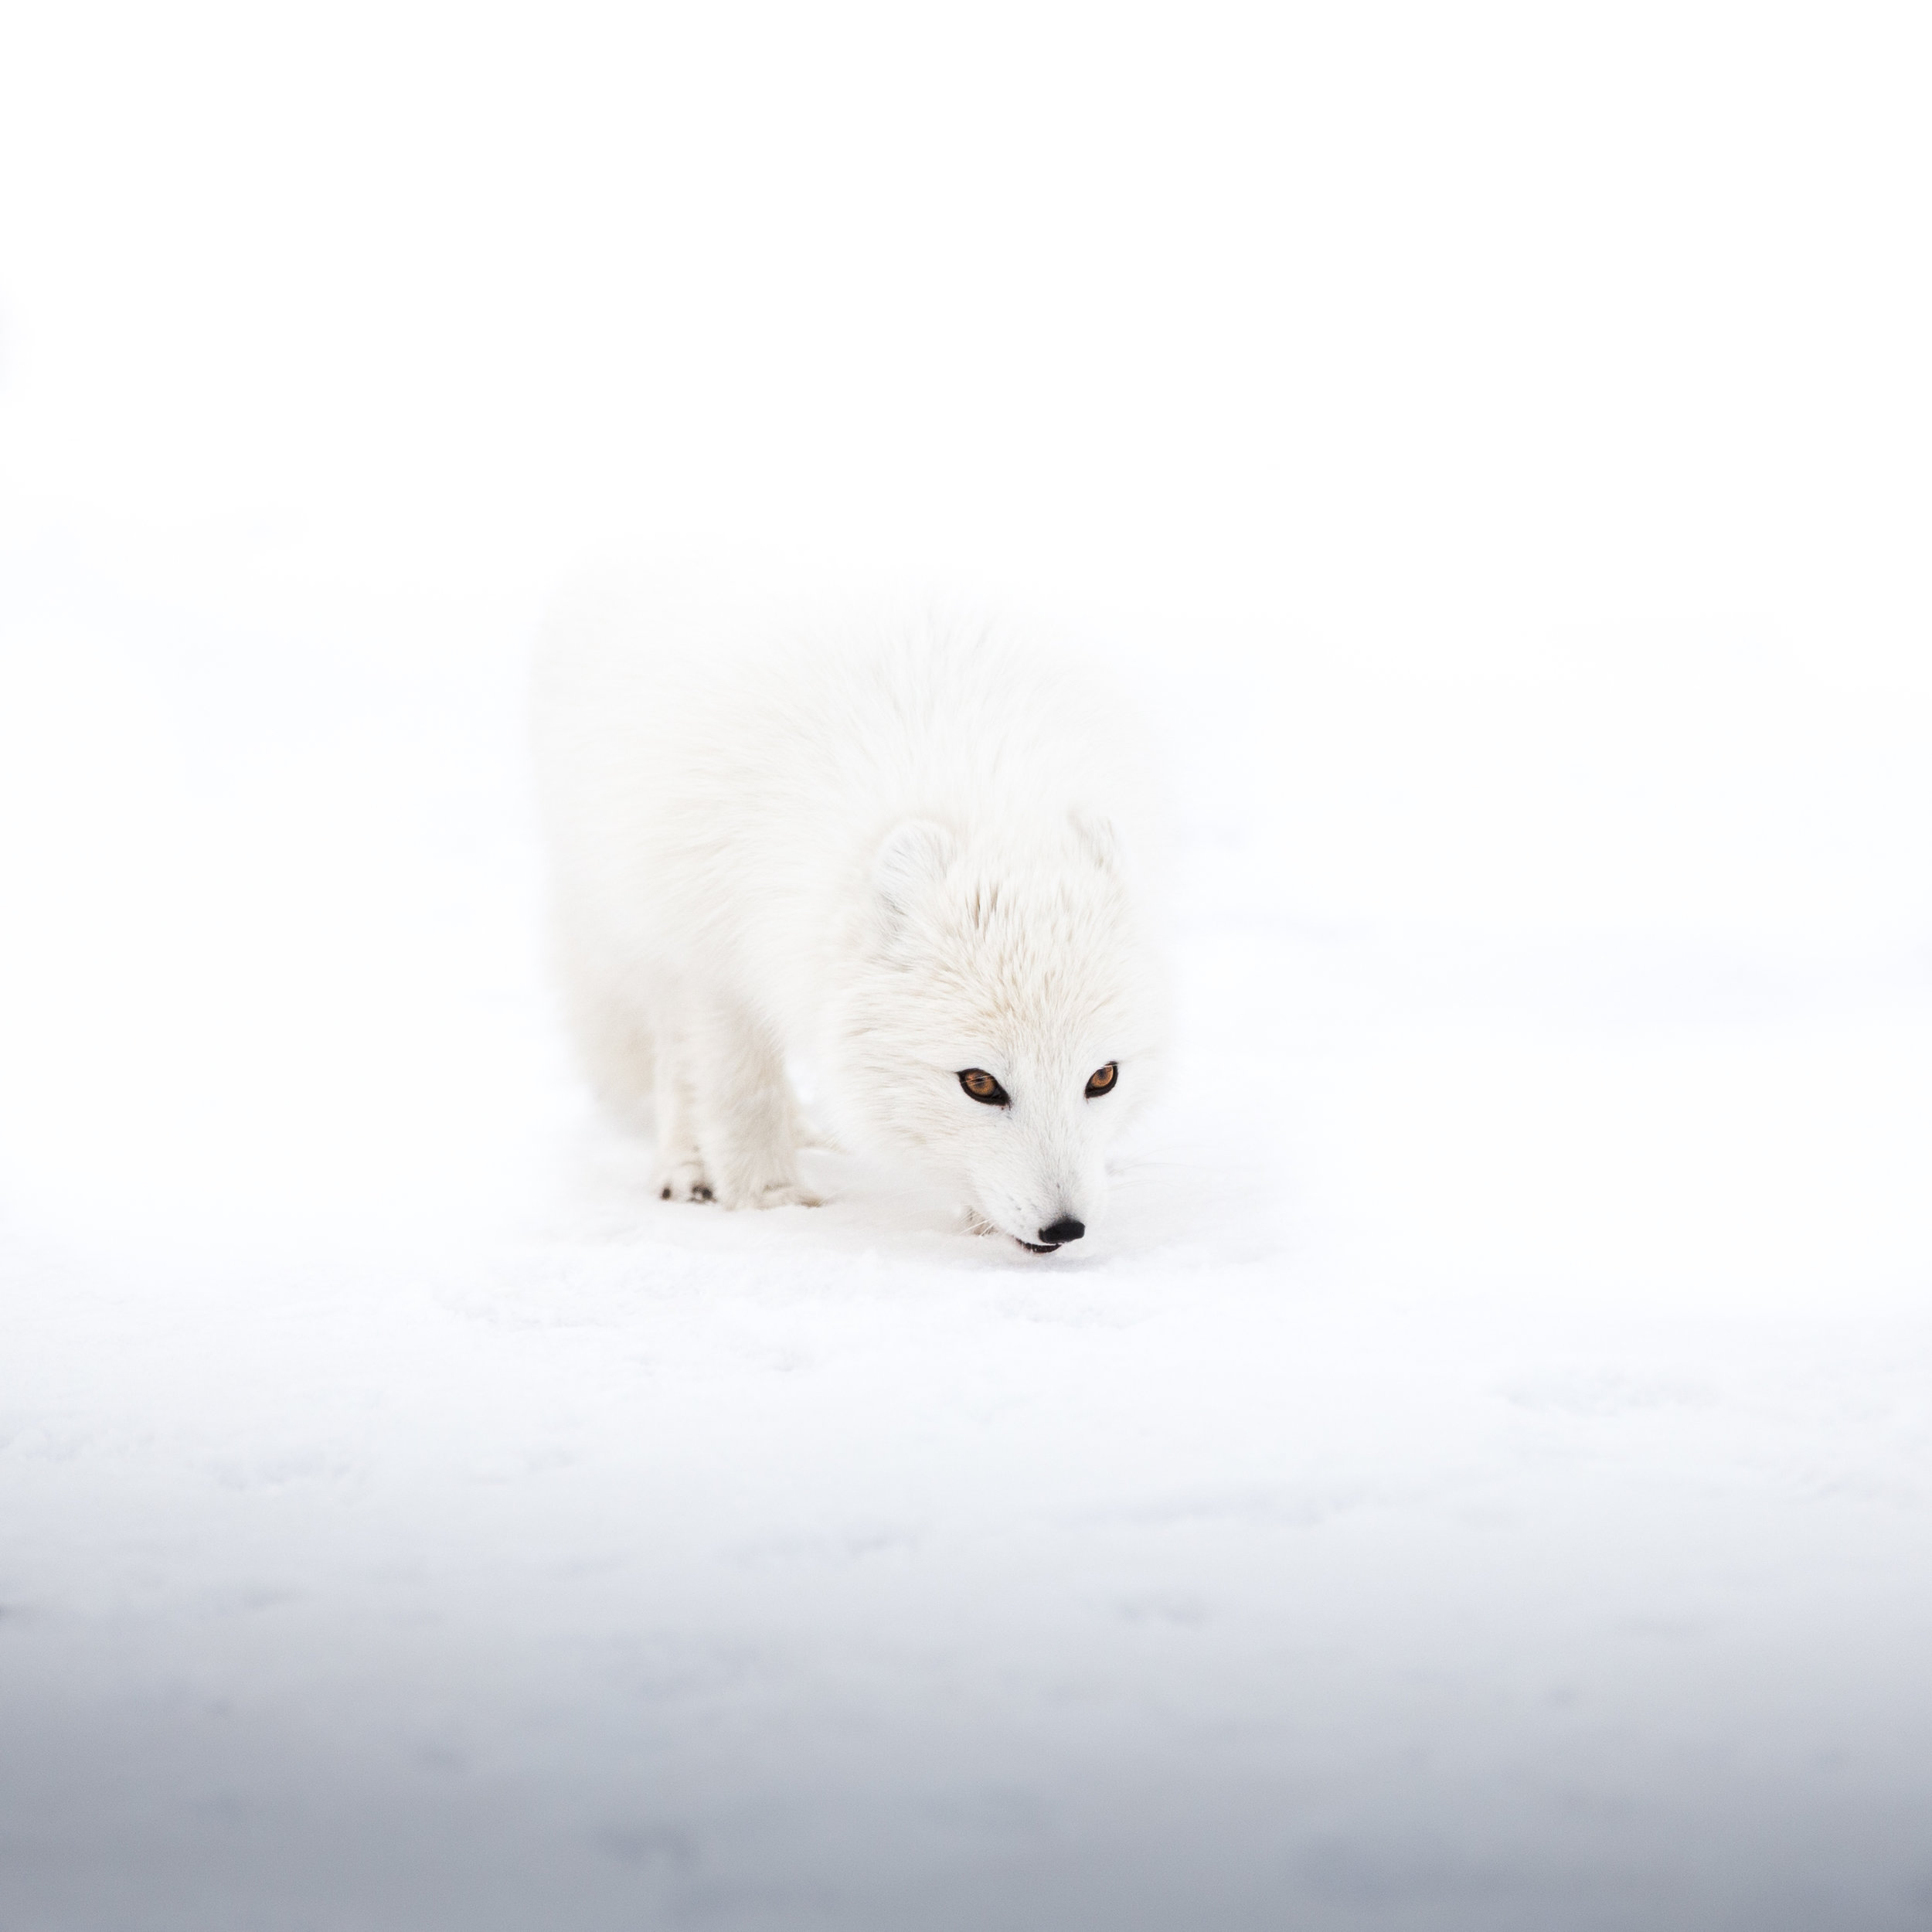 jermiah-schuster-iceland-250.jpg